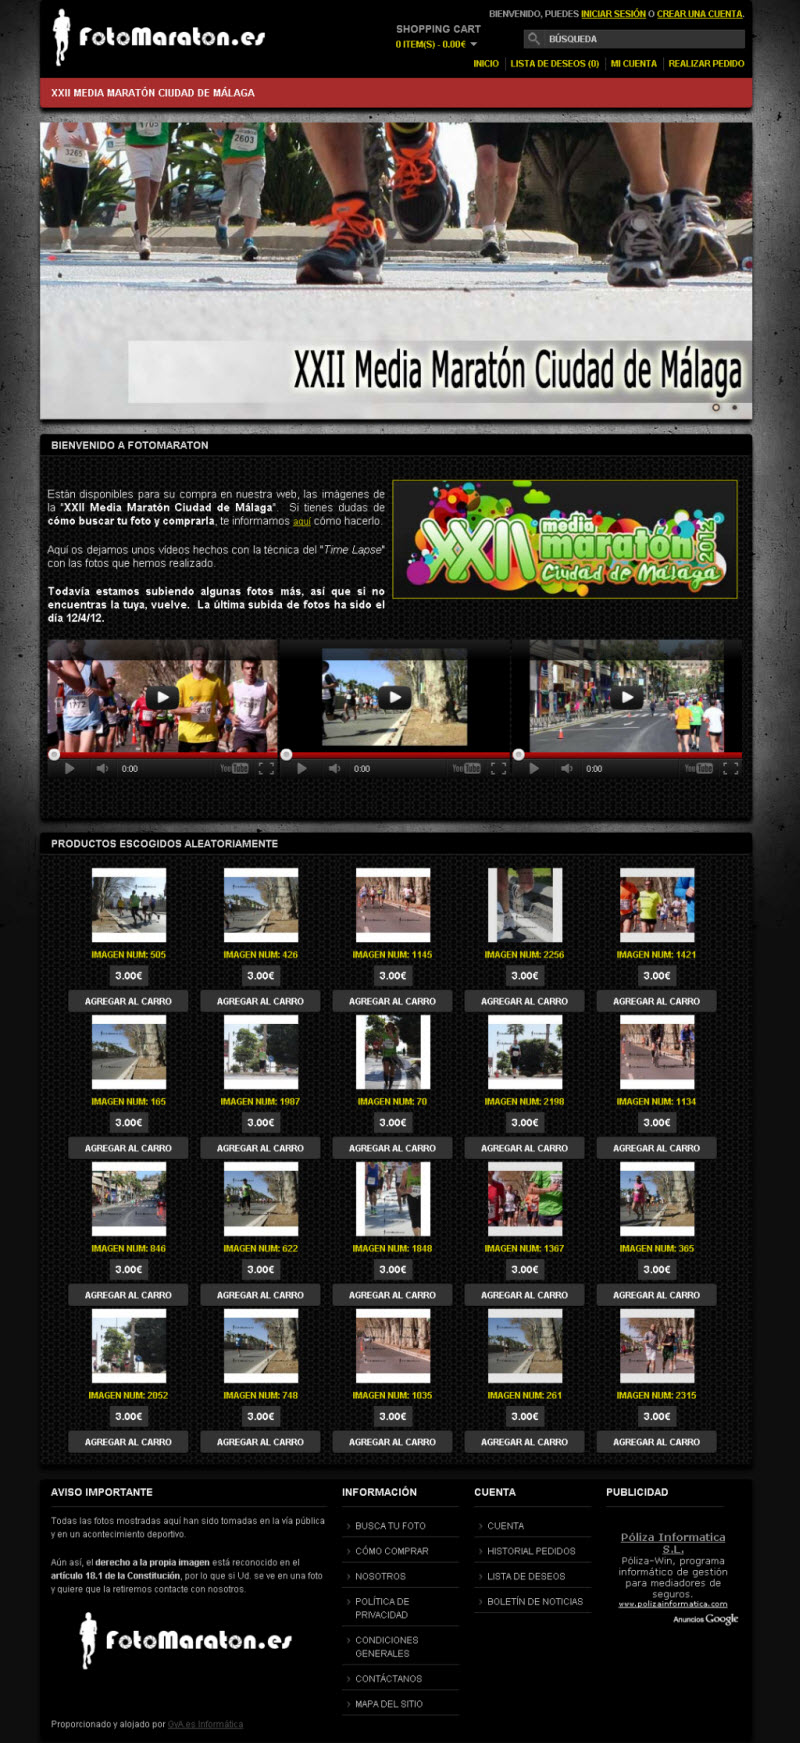 FotoMaraton.es. Fotografías deportivas